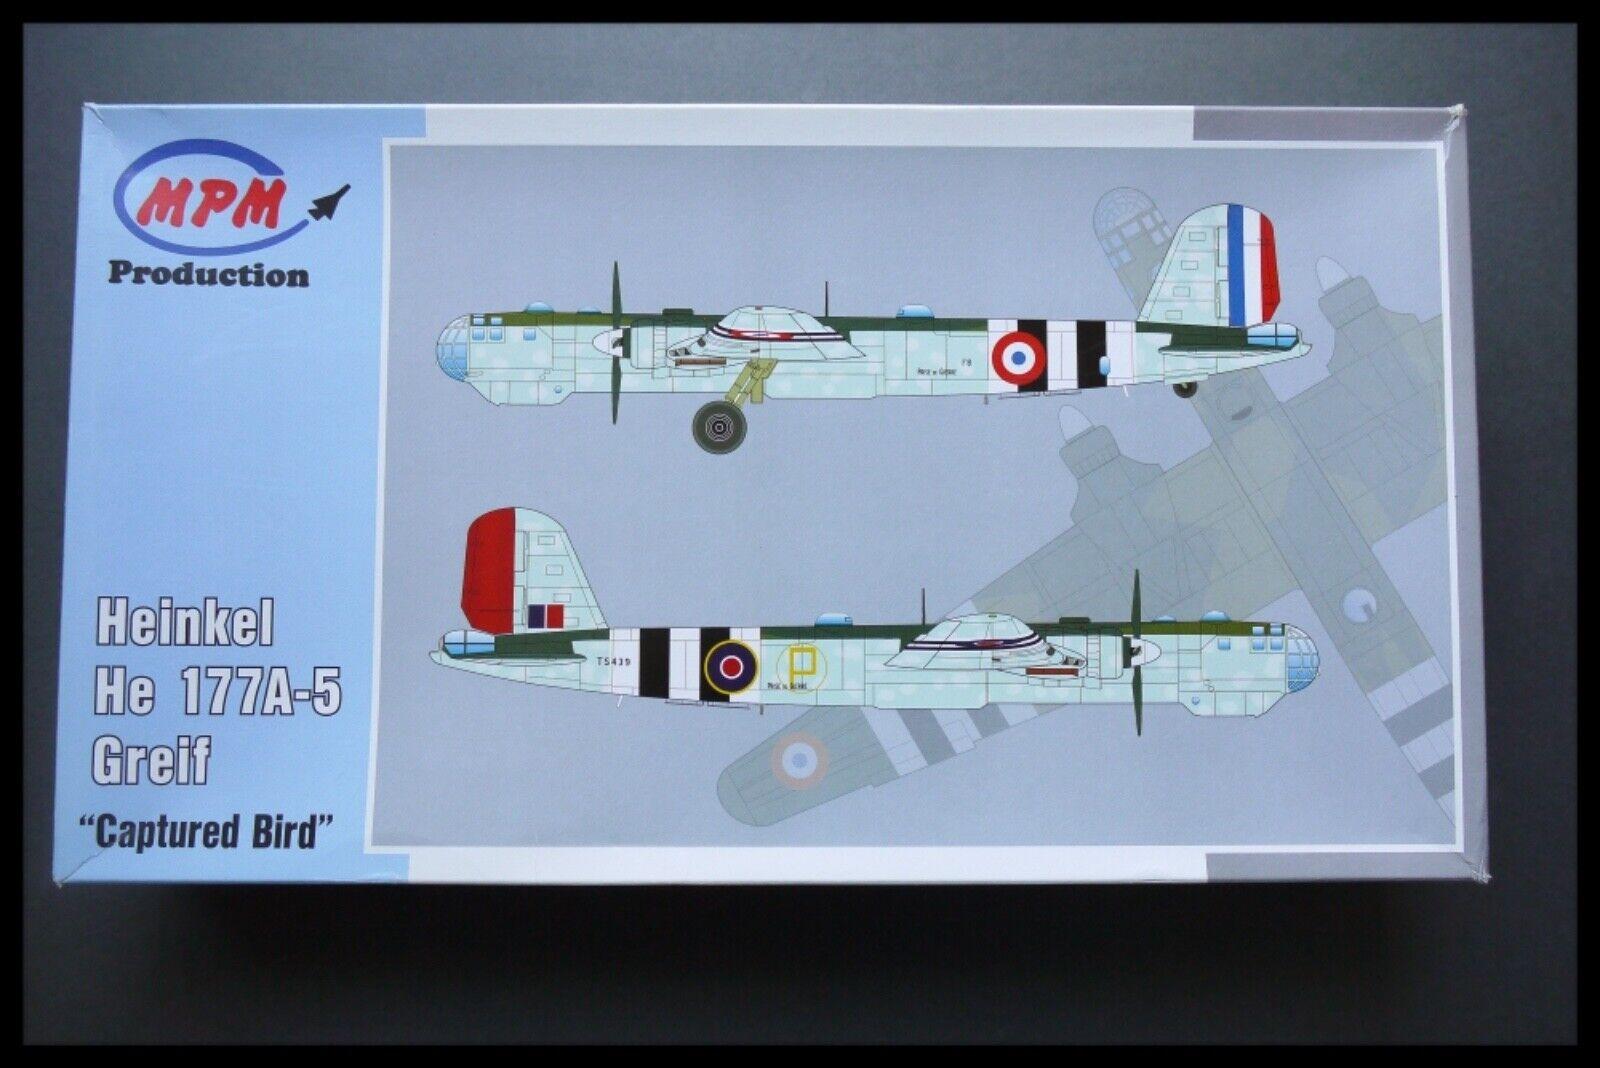 RARE mpm 1  48, Heinkel Heinkel Heinkel He 177 a - 5 greif 5ab